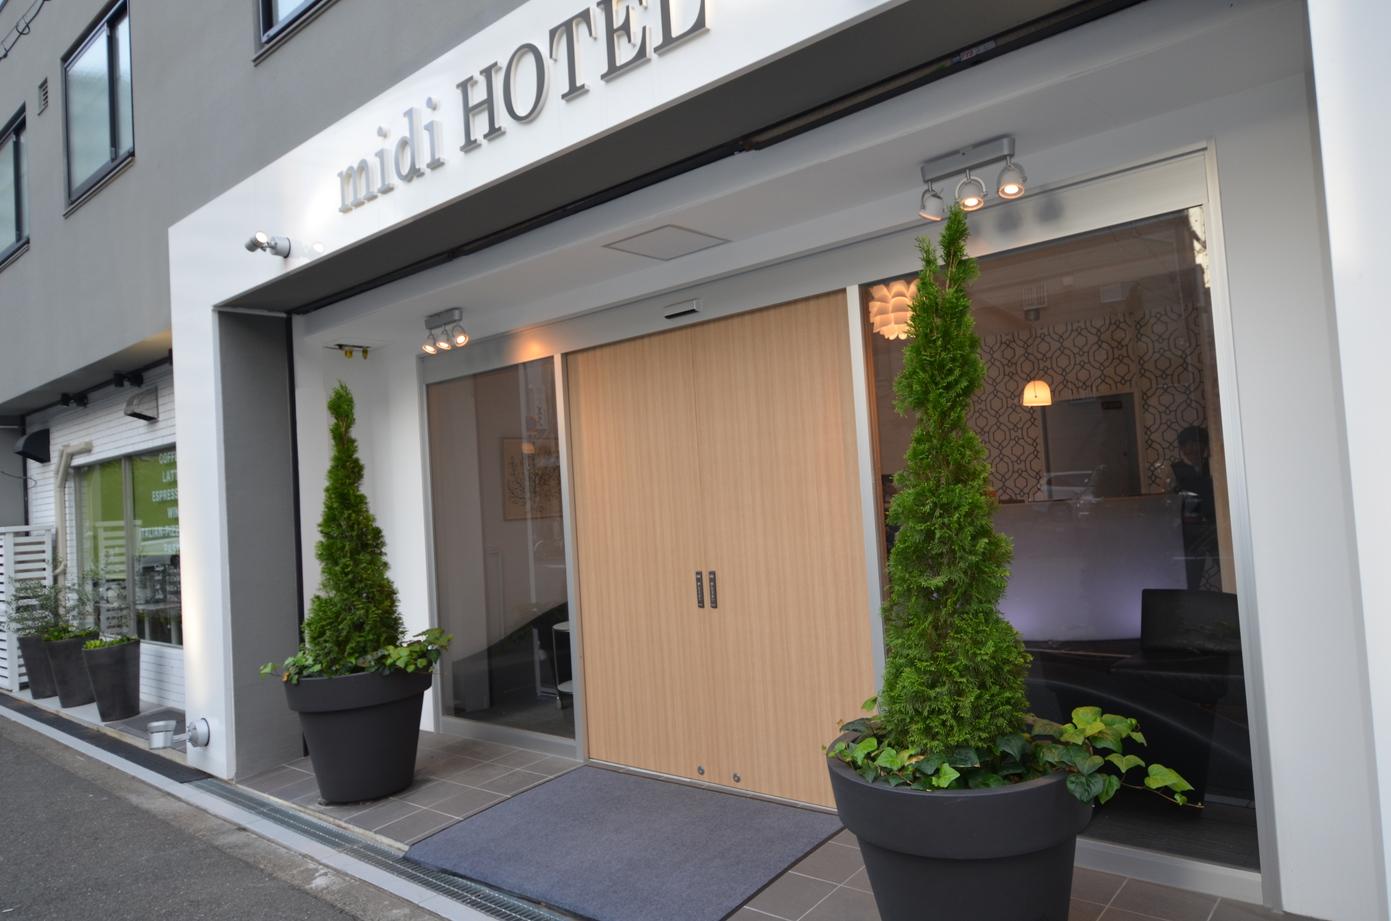 midi HOTEL(ミディホテル)...